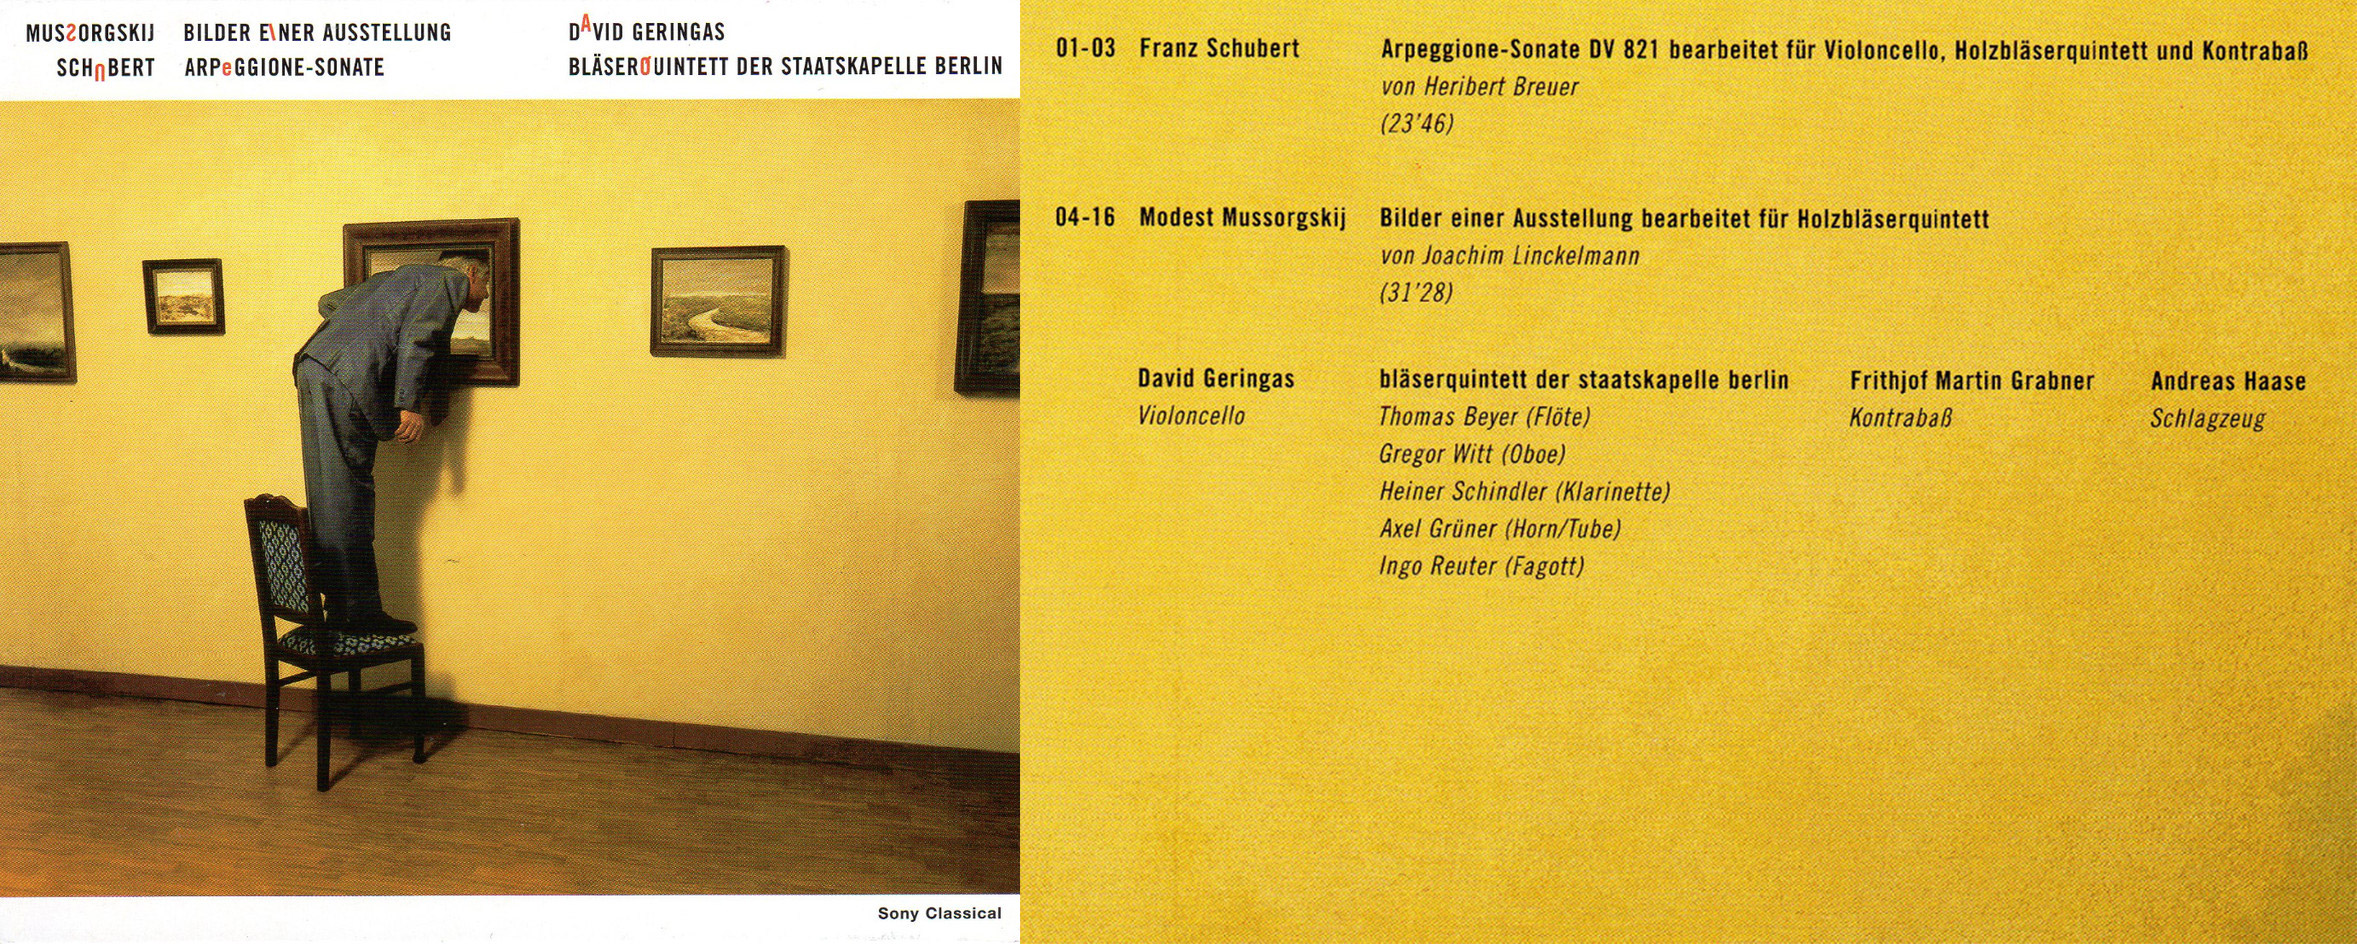 RONDO | Franz Schubert, Modest Mussorgski